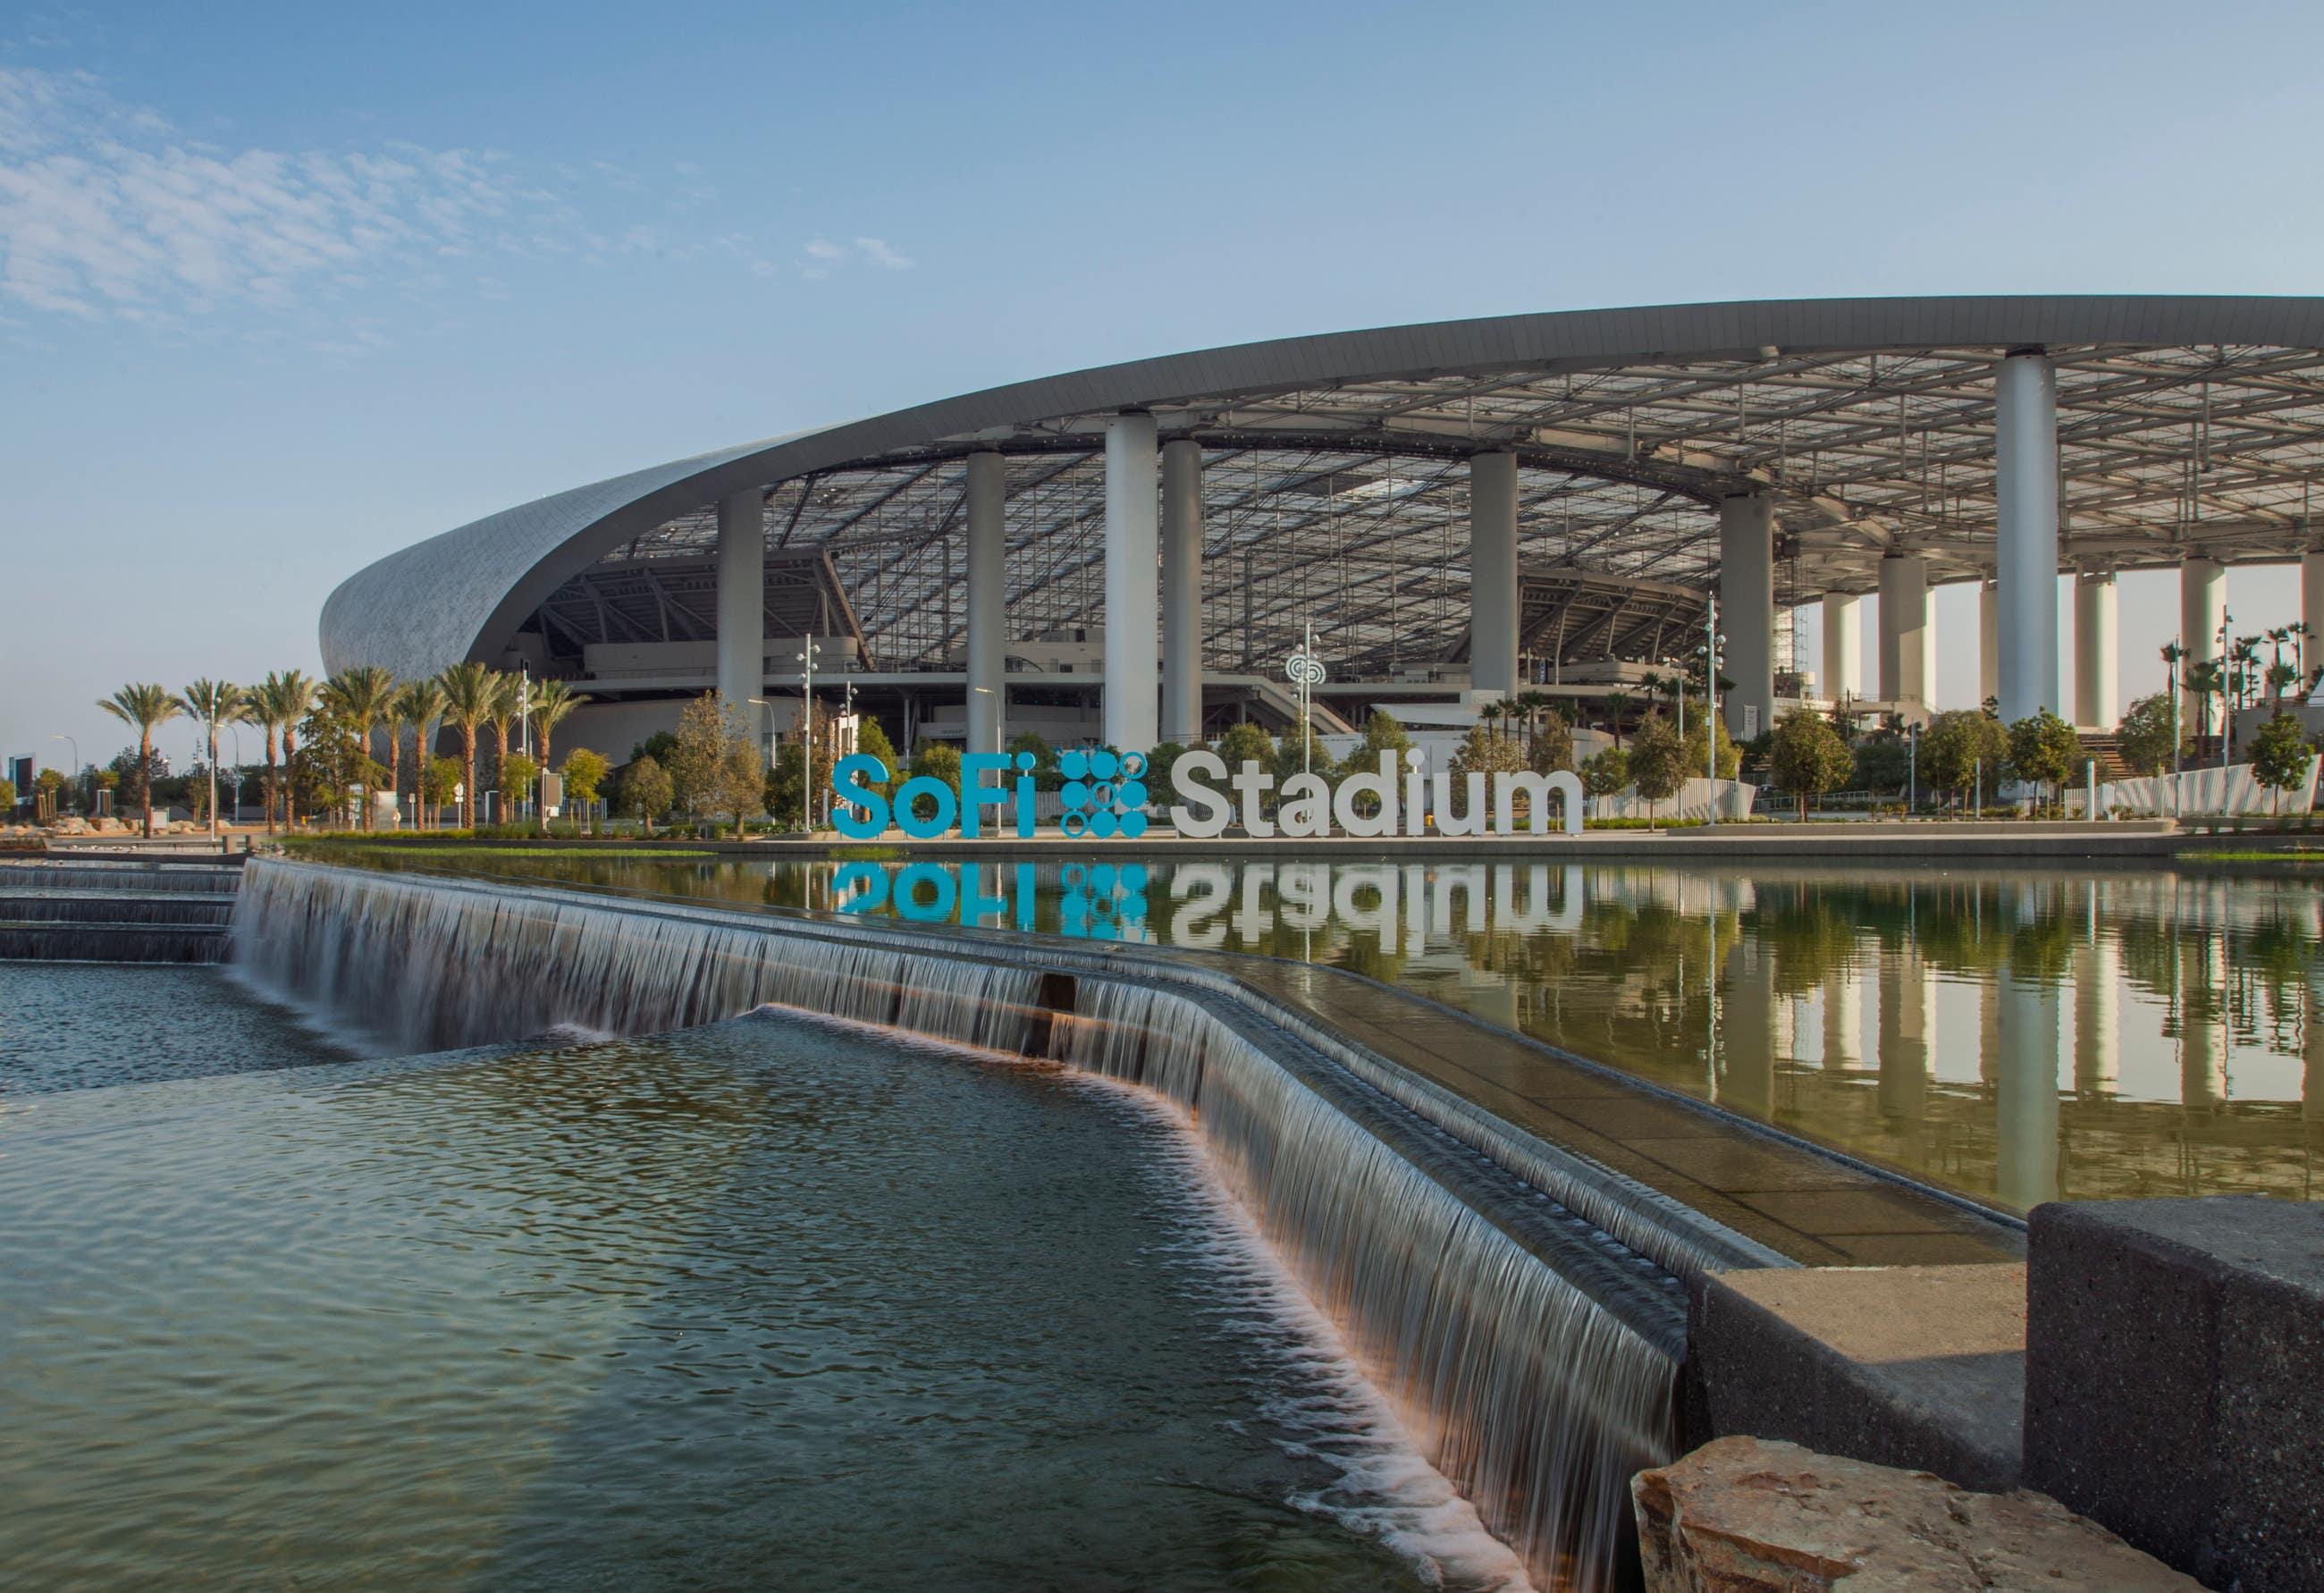 SoFi Stadium at Hollywood Park